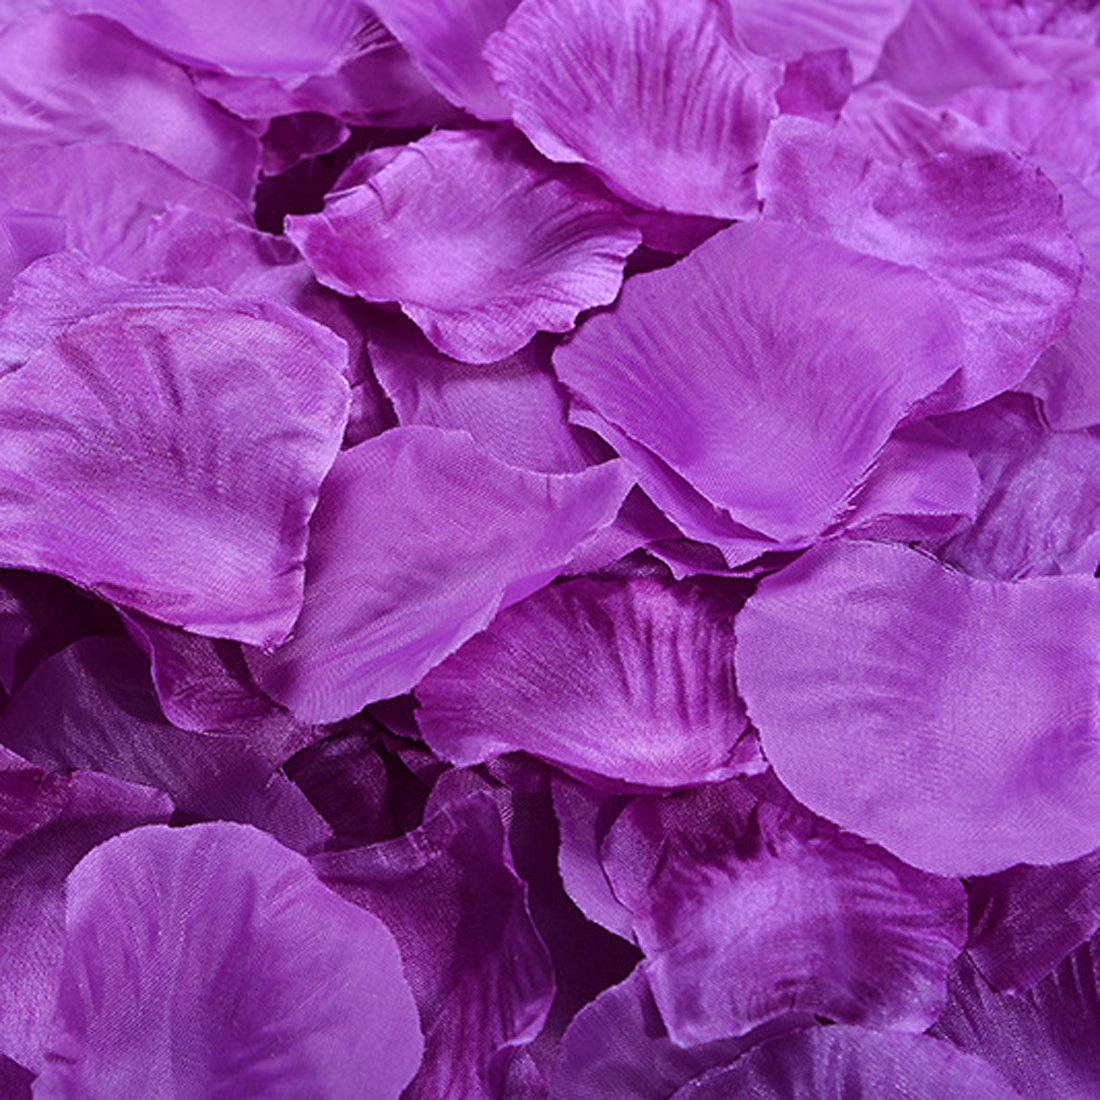 juyo vonsan 1000pcs purple artificial rose pettals for wedding decor